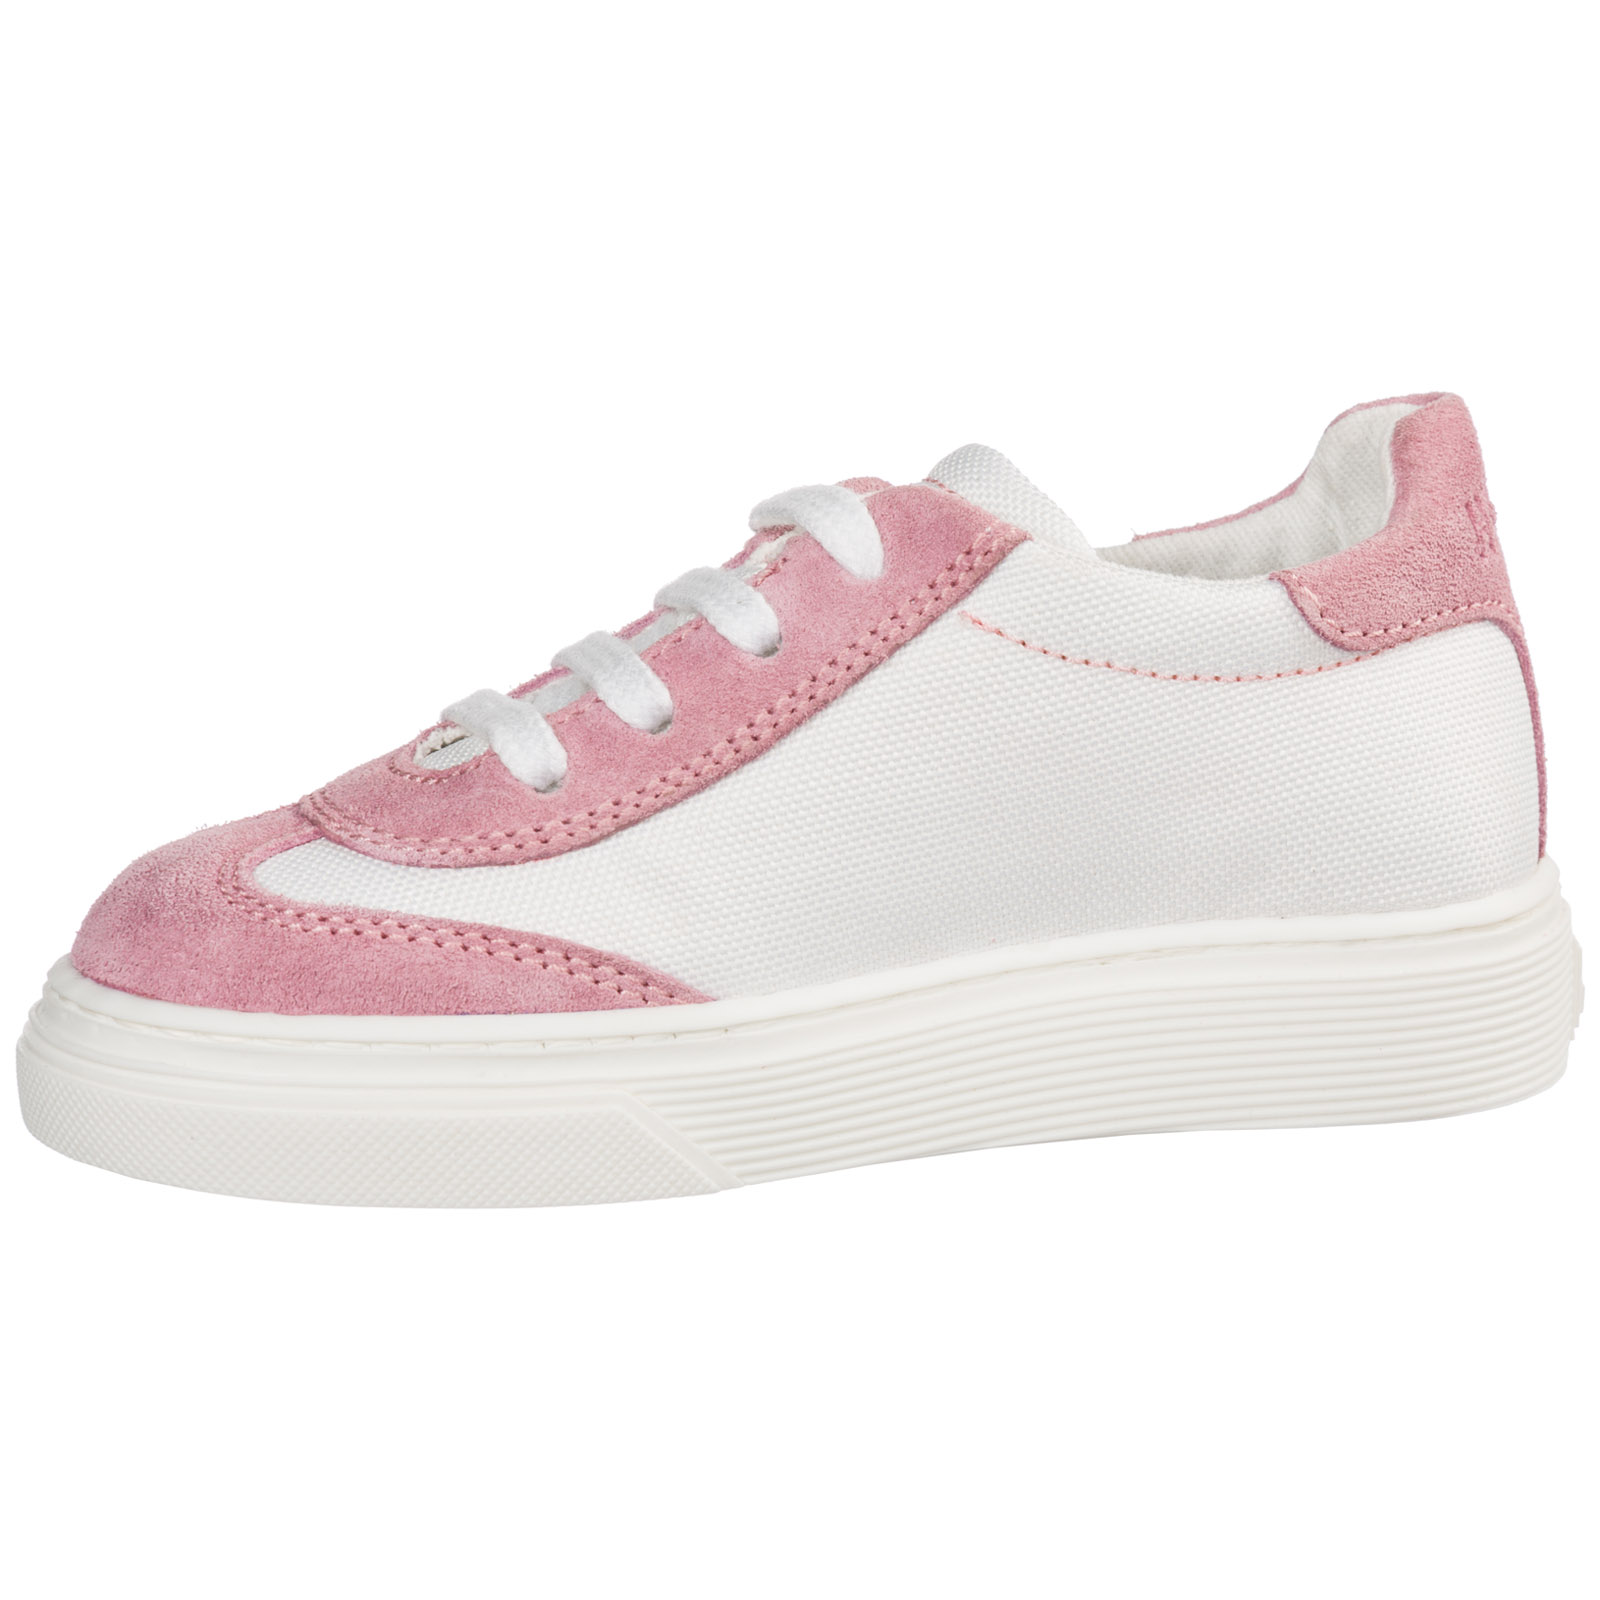 Scarpe sneakers bimba bambina camoscio h365